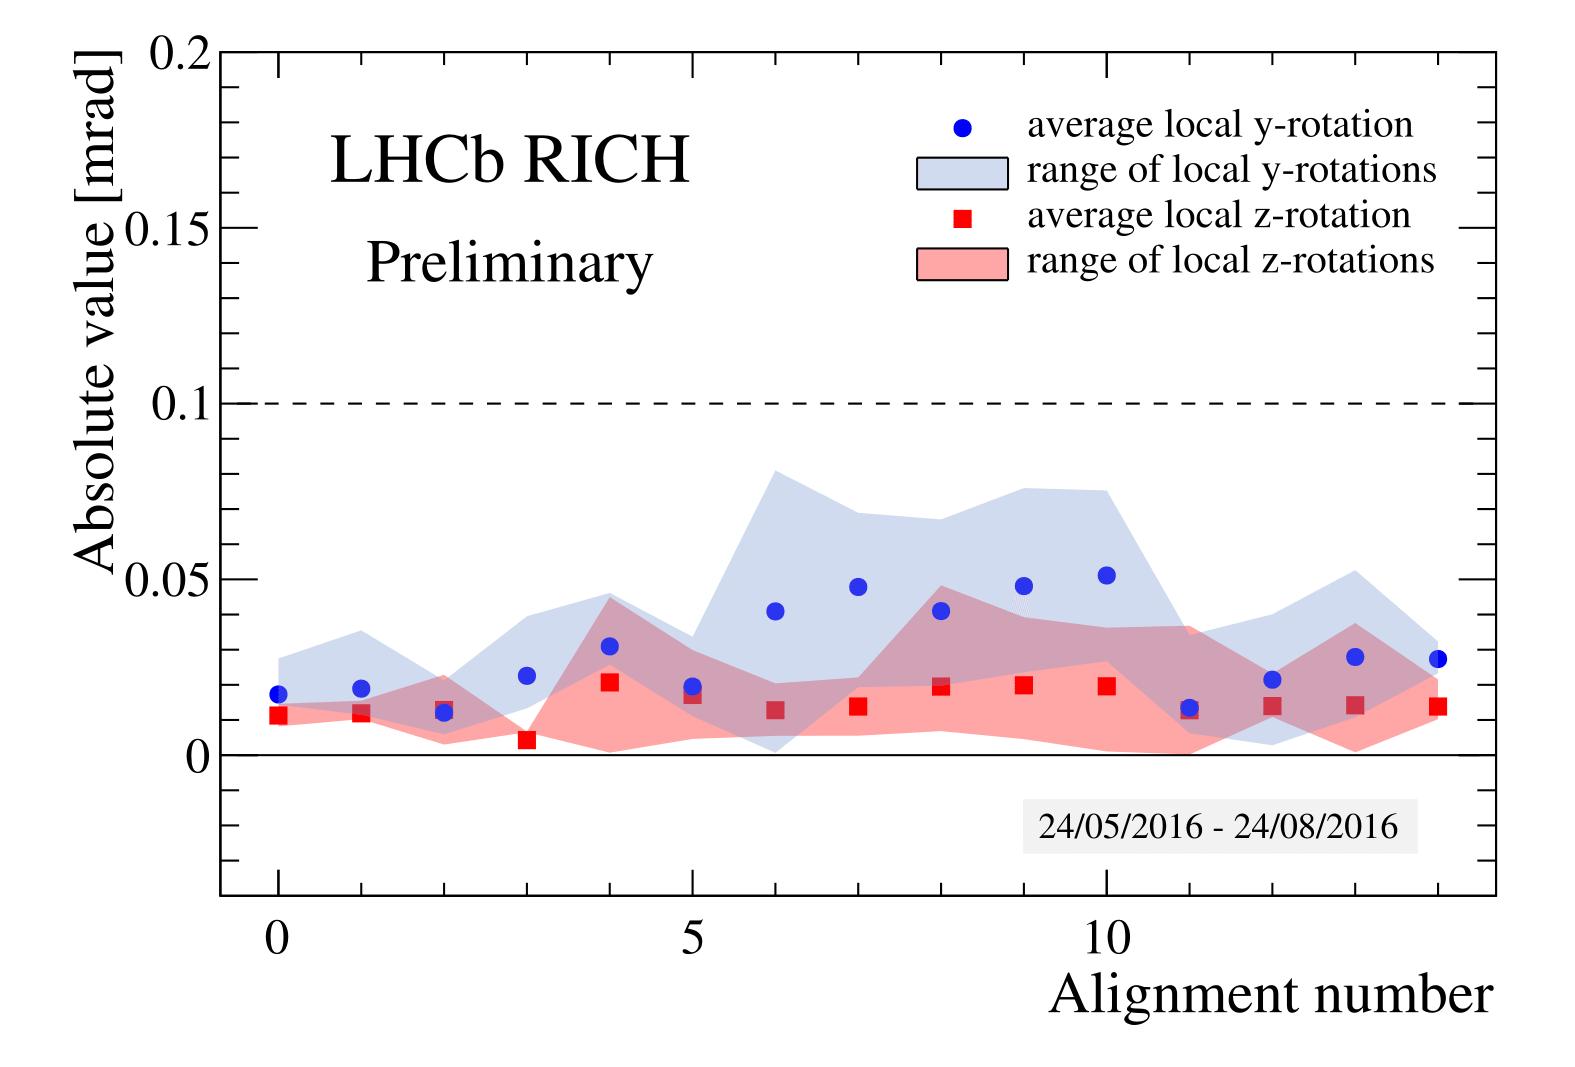 Rich1_absav_range.1-1.png